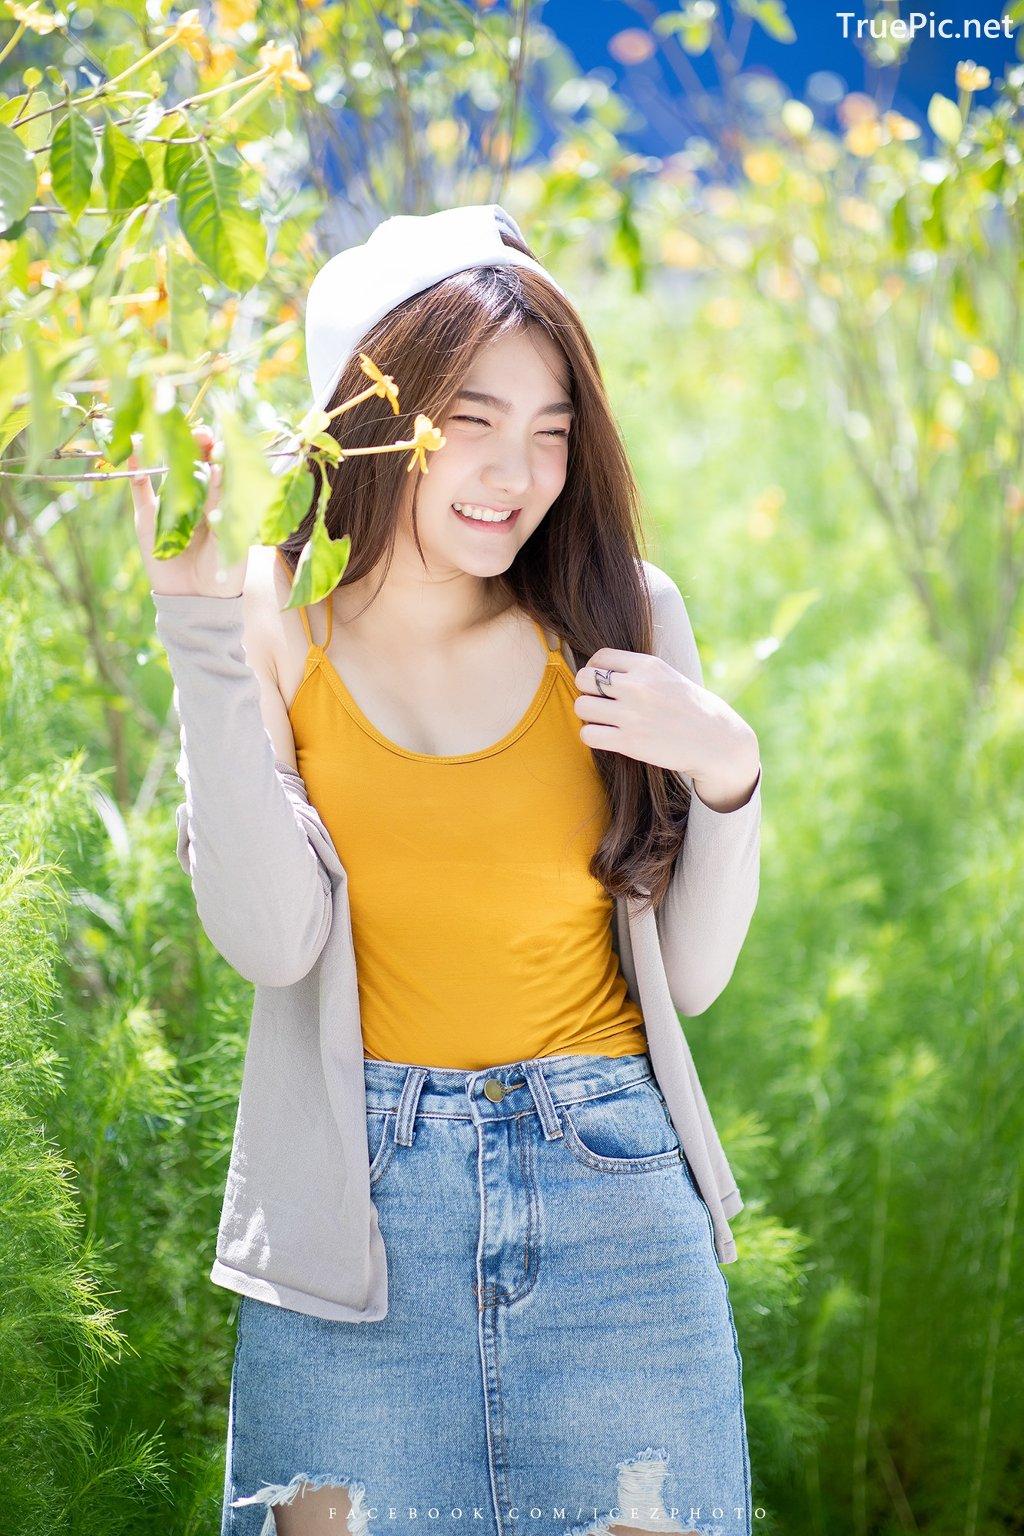 Image-Thailand-Cute-Model-Creammy-Chanama-Beautiful-Angel-In-Flower-Garden-TruePic.net- Picture-7